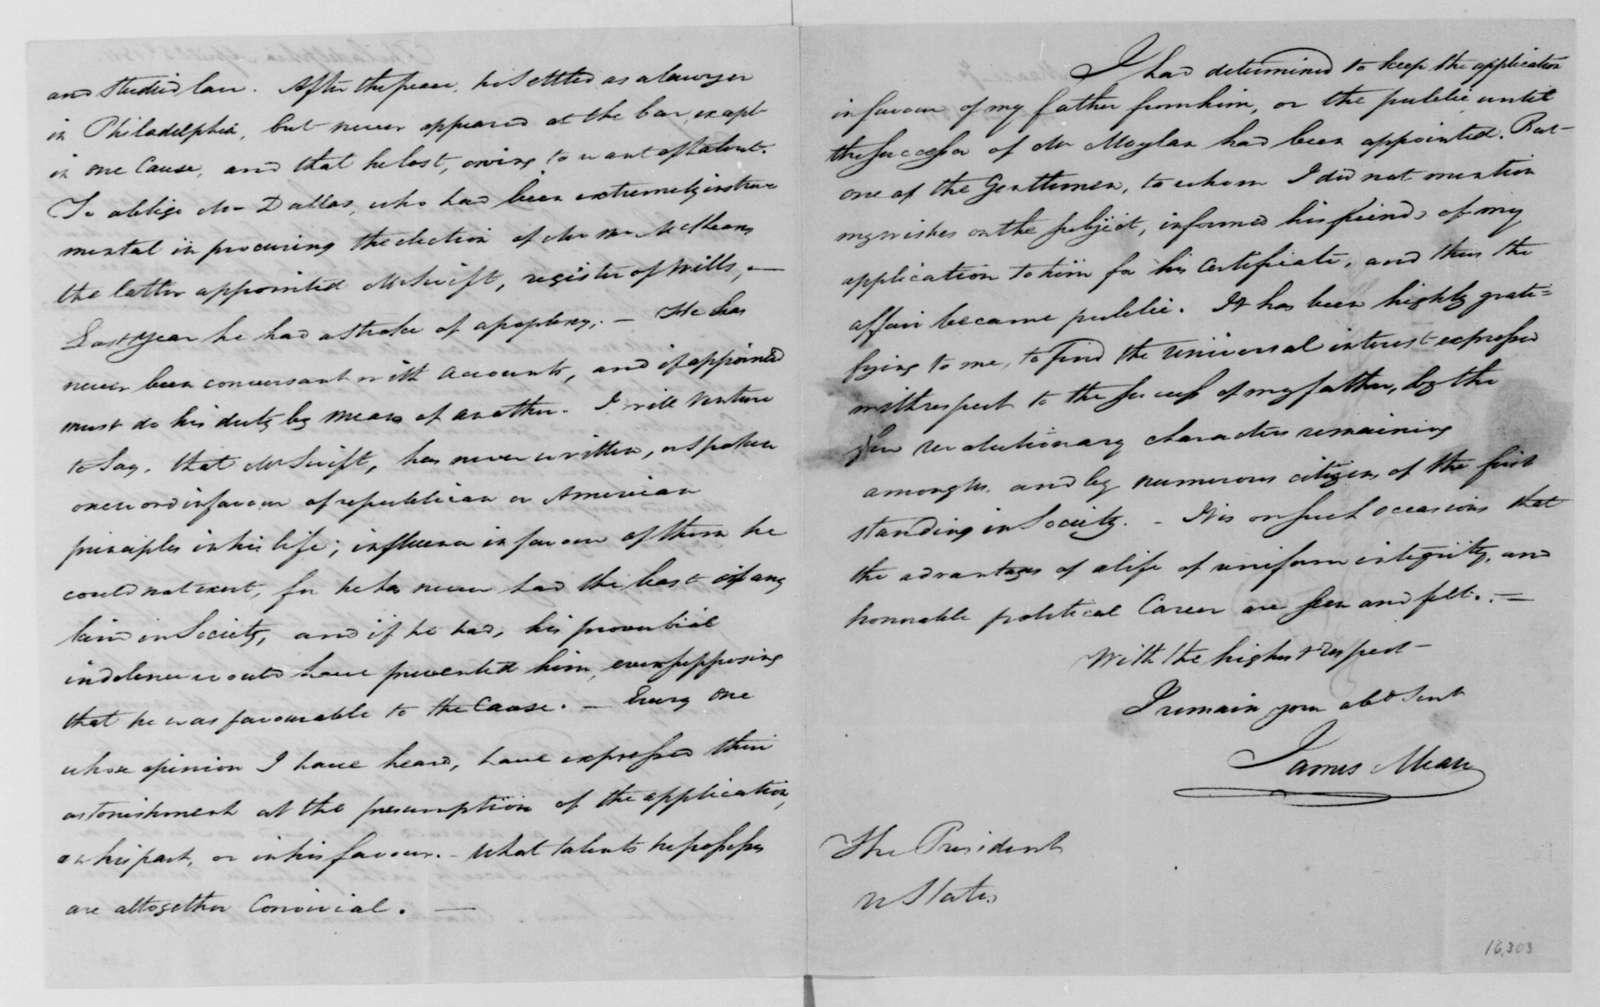 James Mease to James Madison, April 25, 1811.